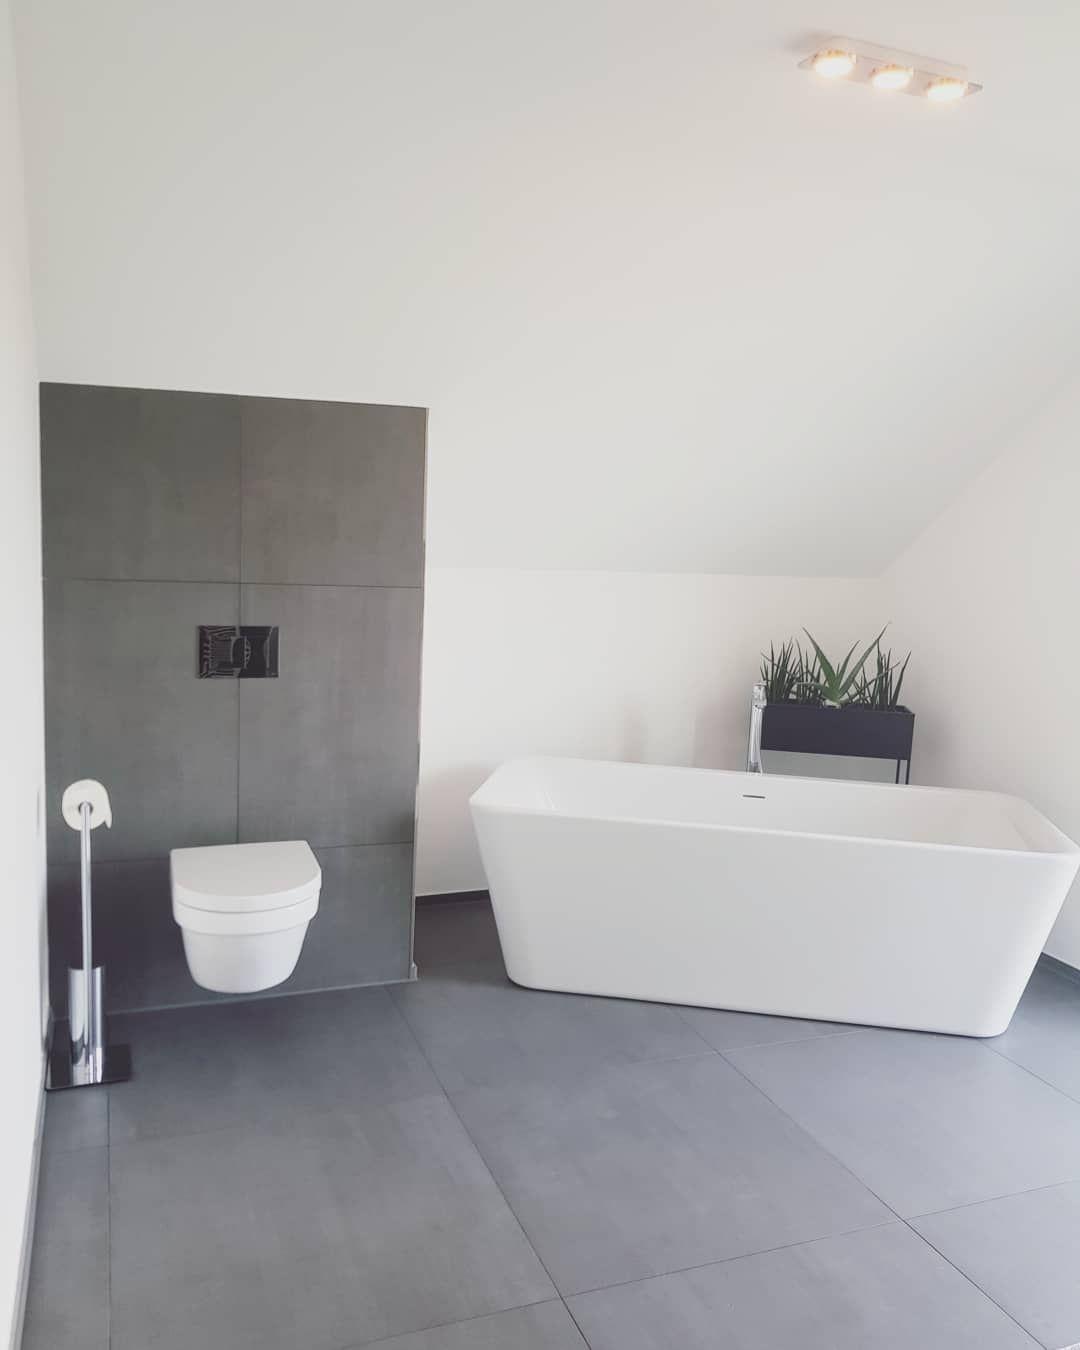 Badezimmerdesign Badezimmer Badezimmer Badezimmerideen